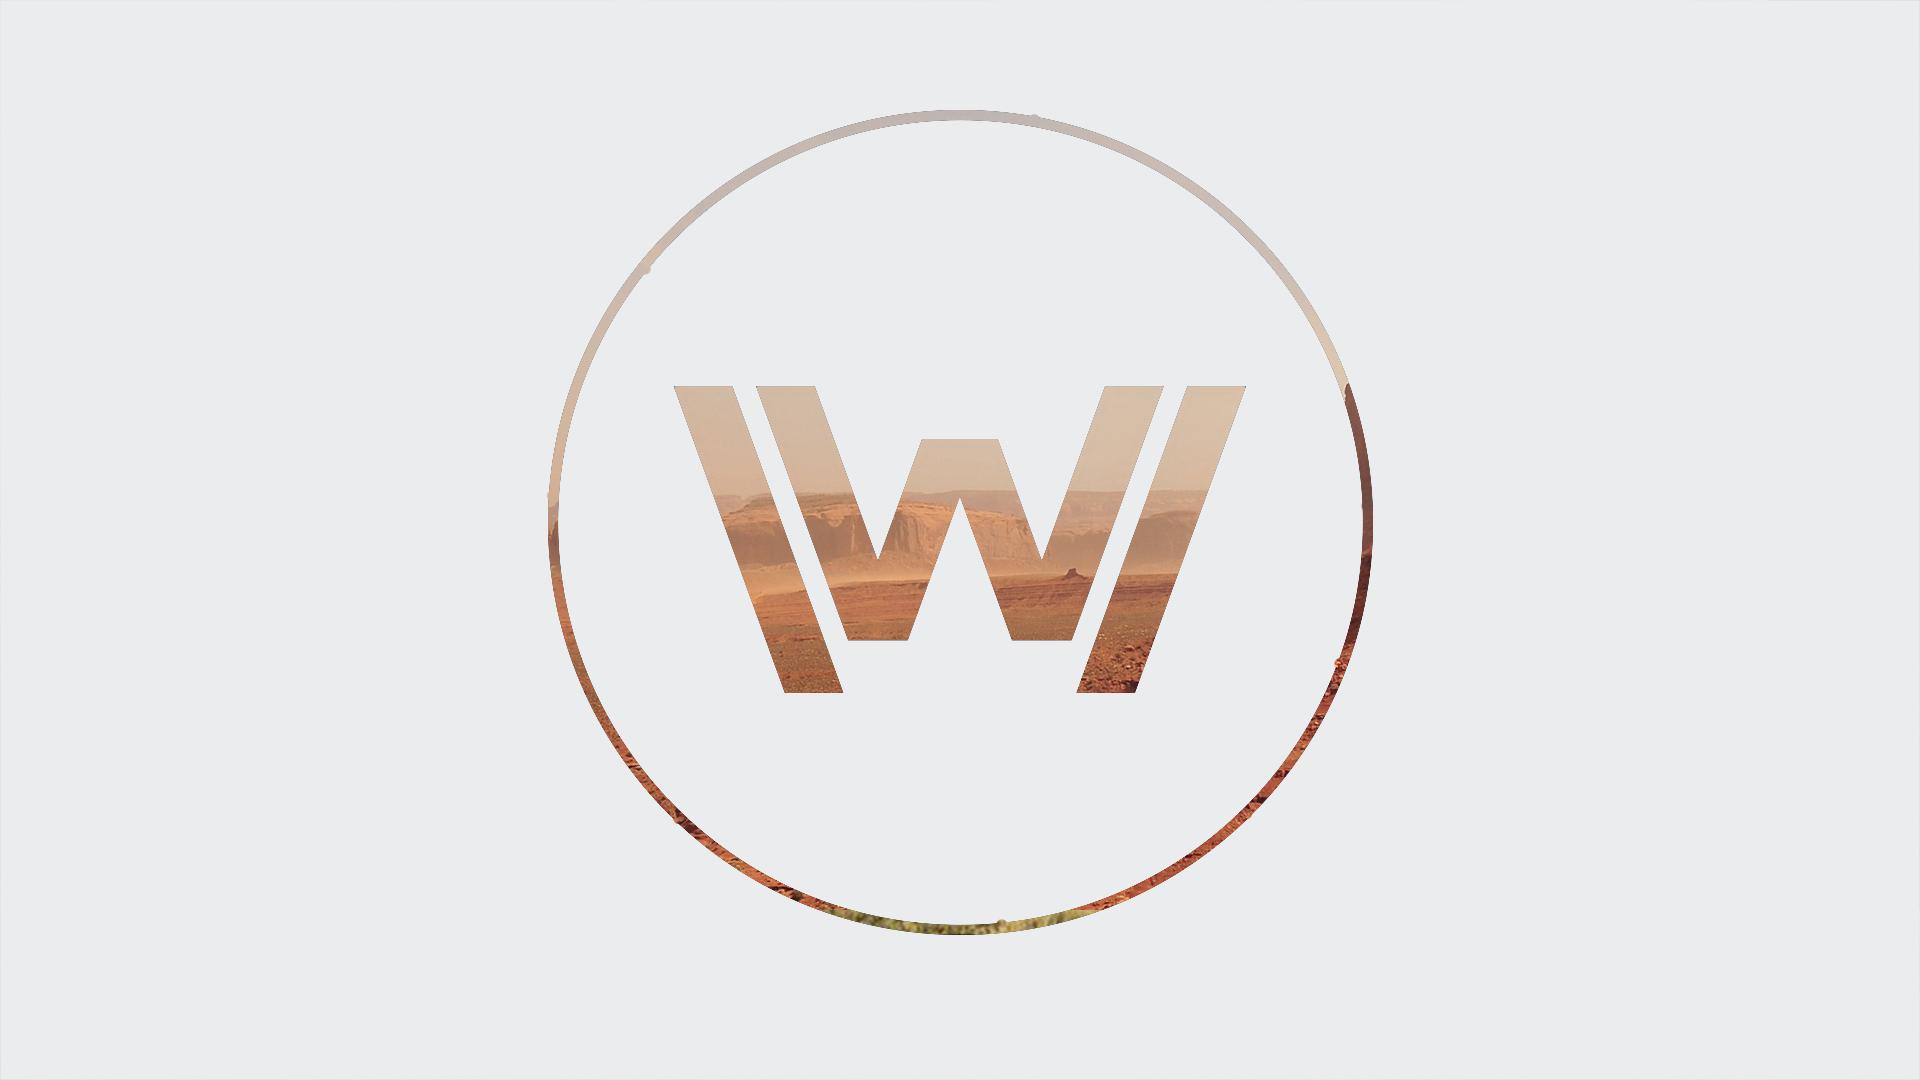 Westworld Logo Wallpapers Westworld Computer Wallpaper Wallpaper